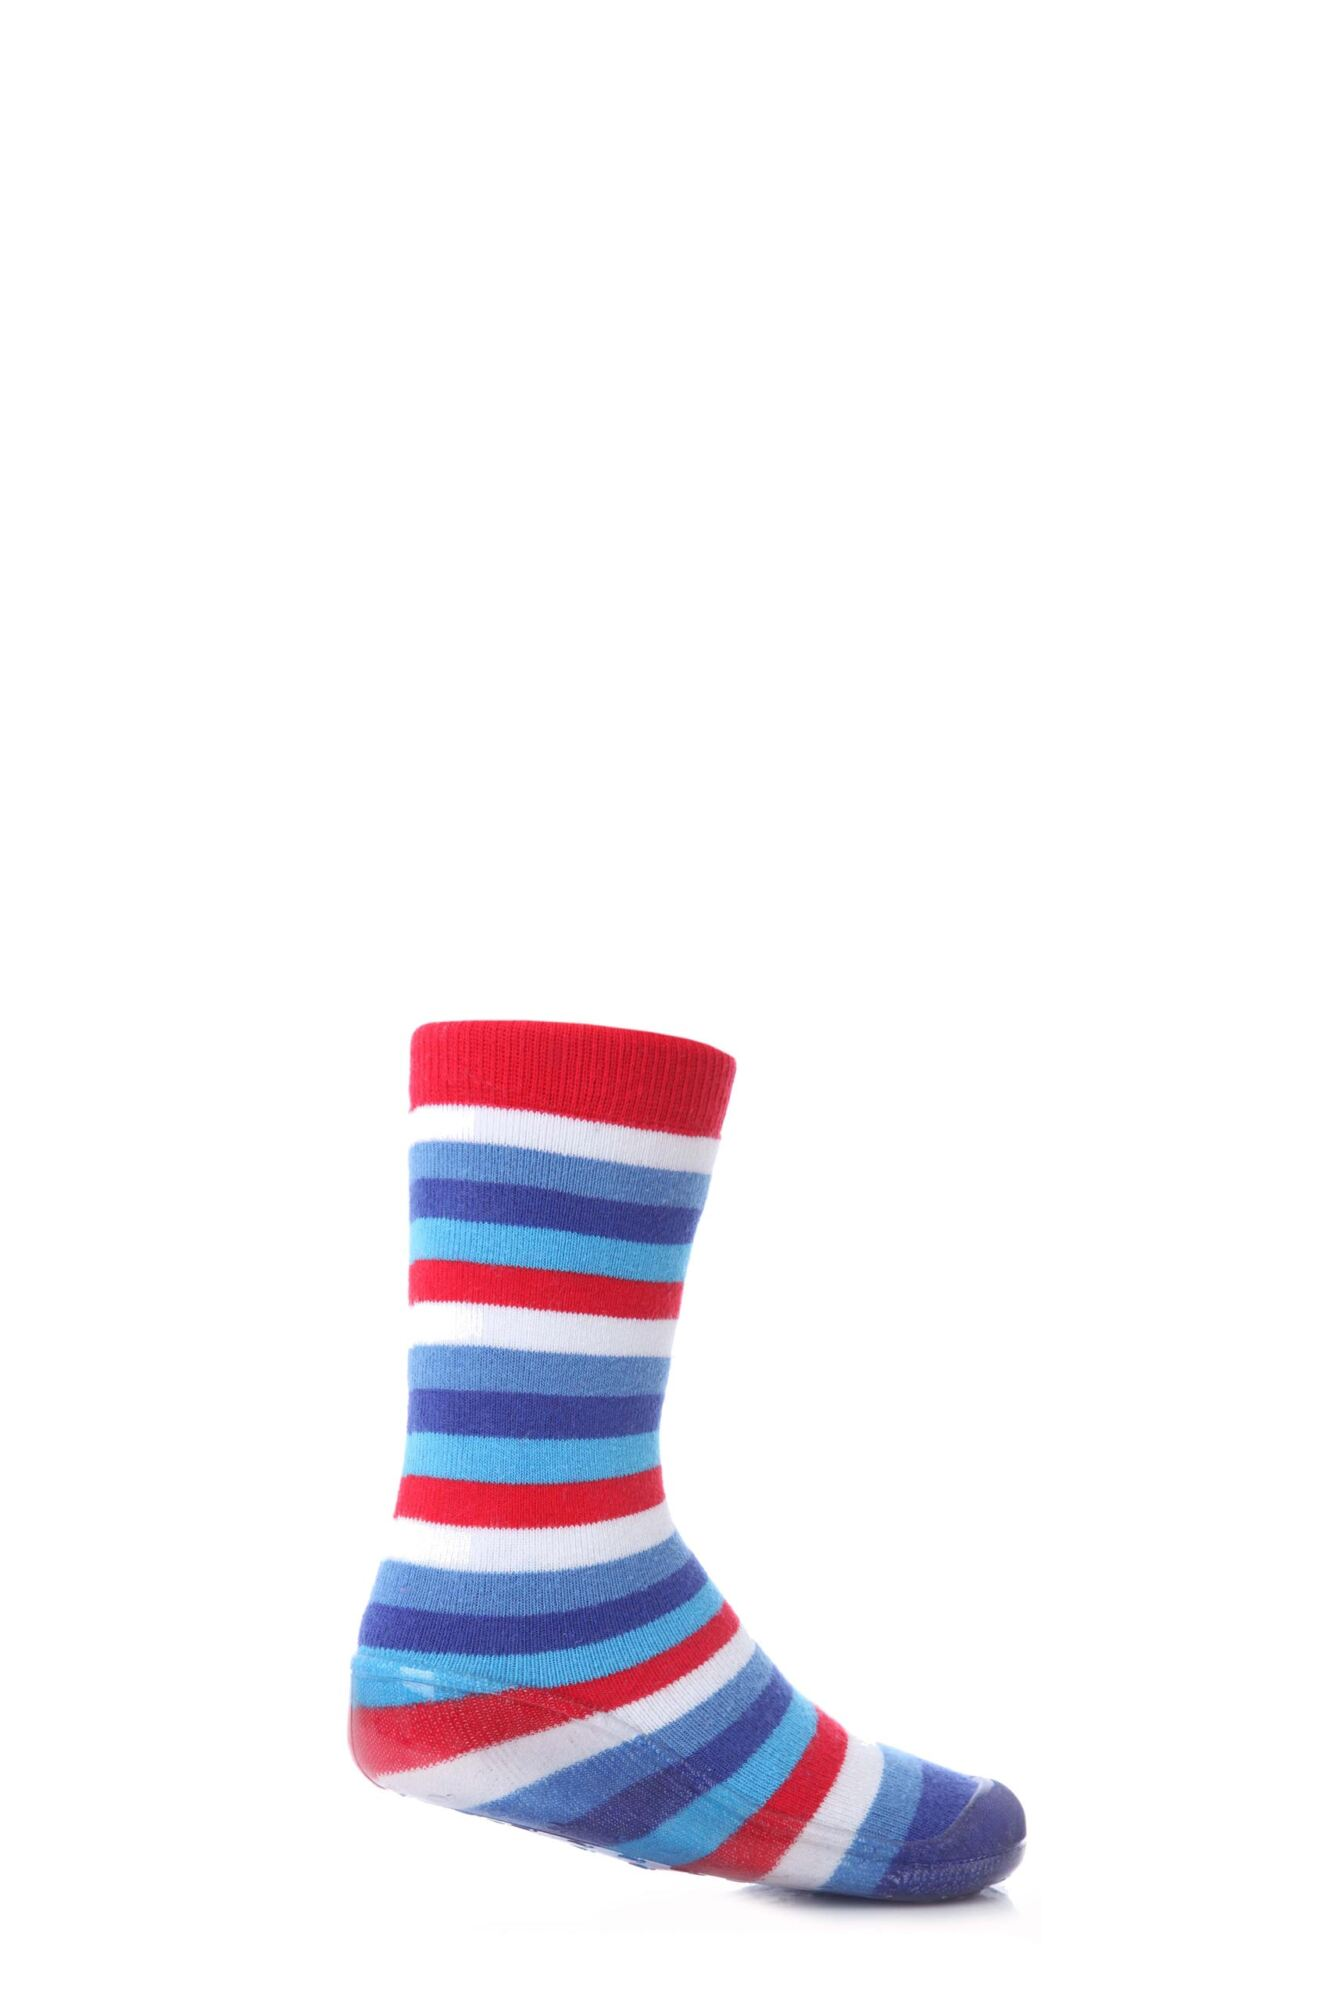 1 Pair Striped Gripper Slipper Socks